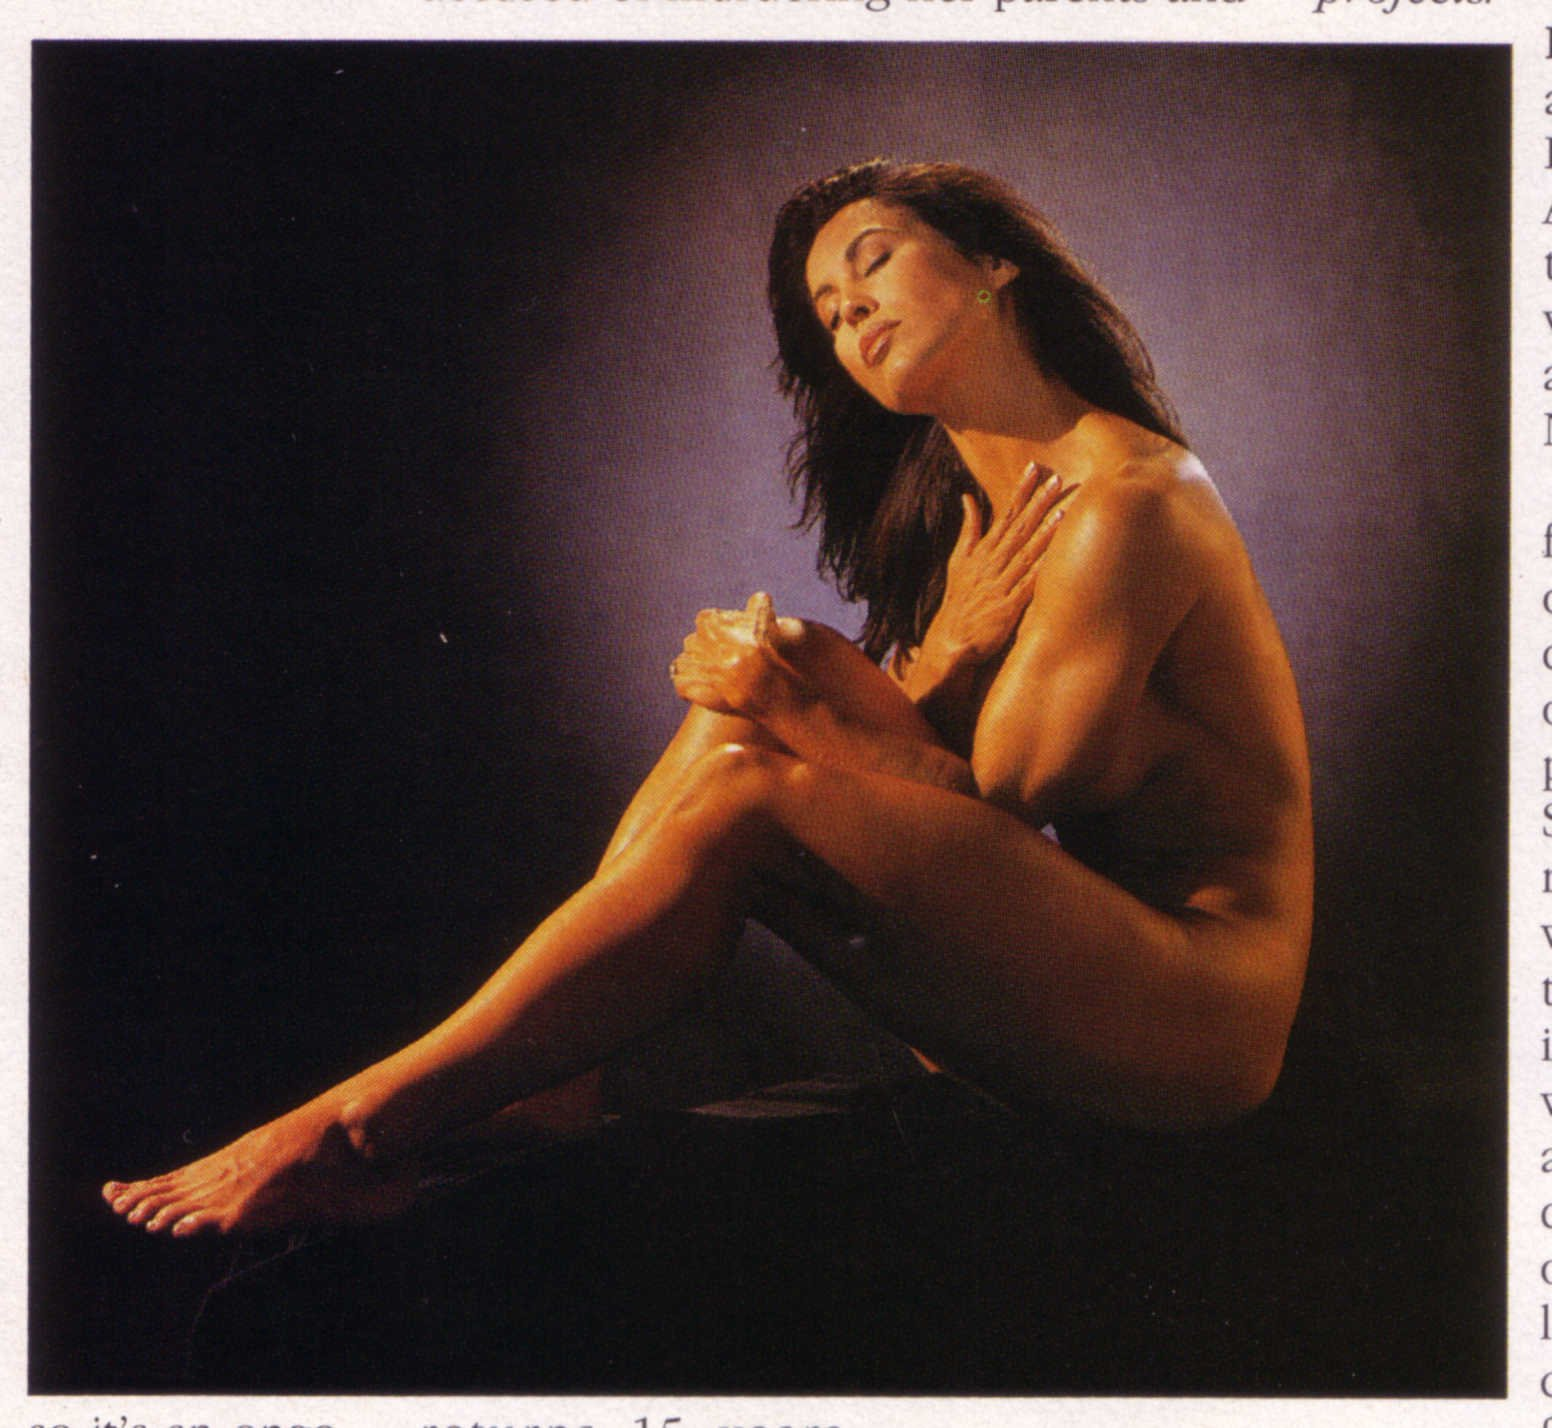 Will Mclish nude rachel